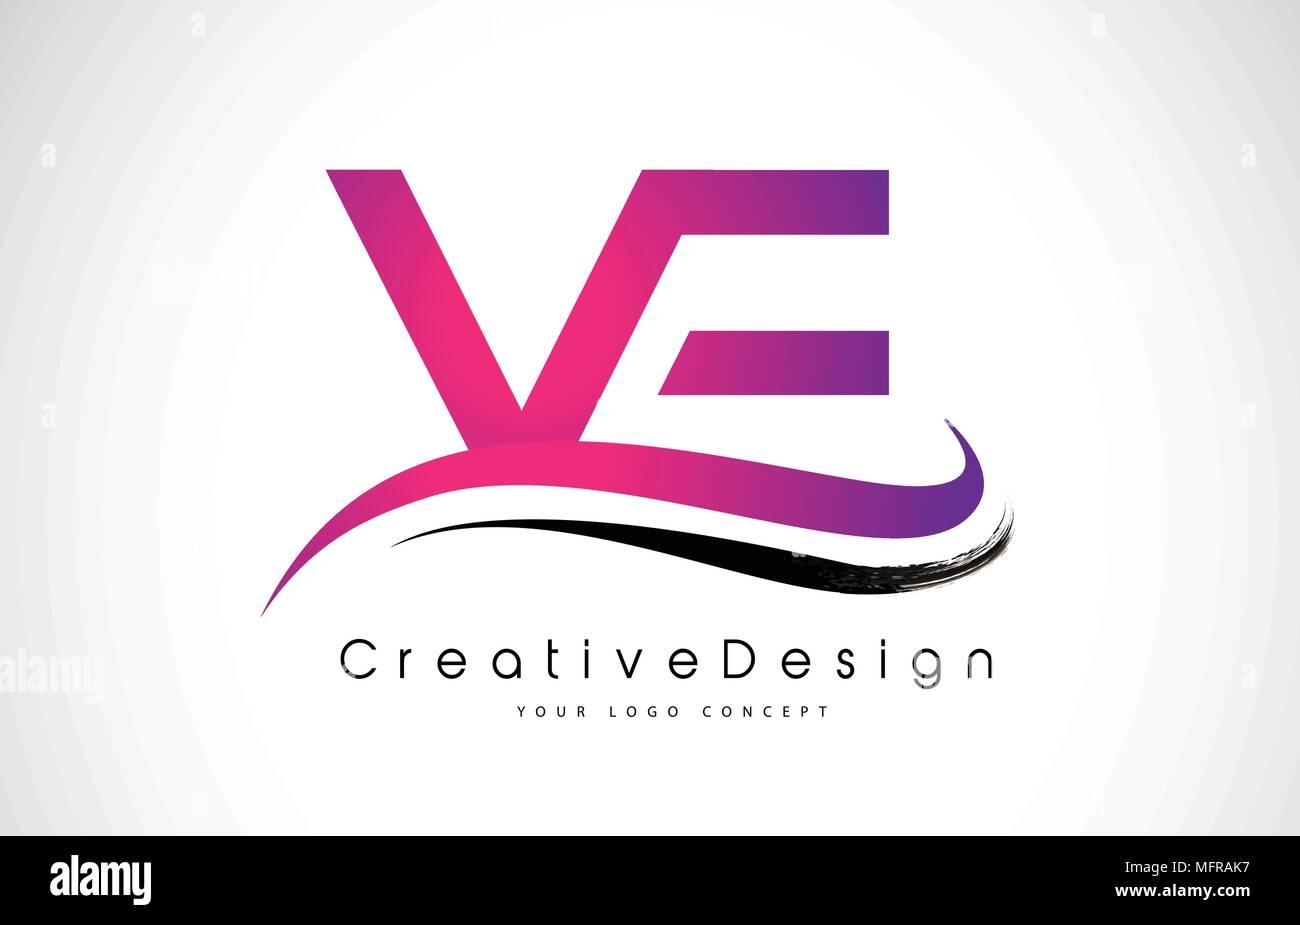 VE V E Letter Logo Design in Black Colors. Creative Modern Letters ...